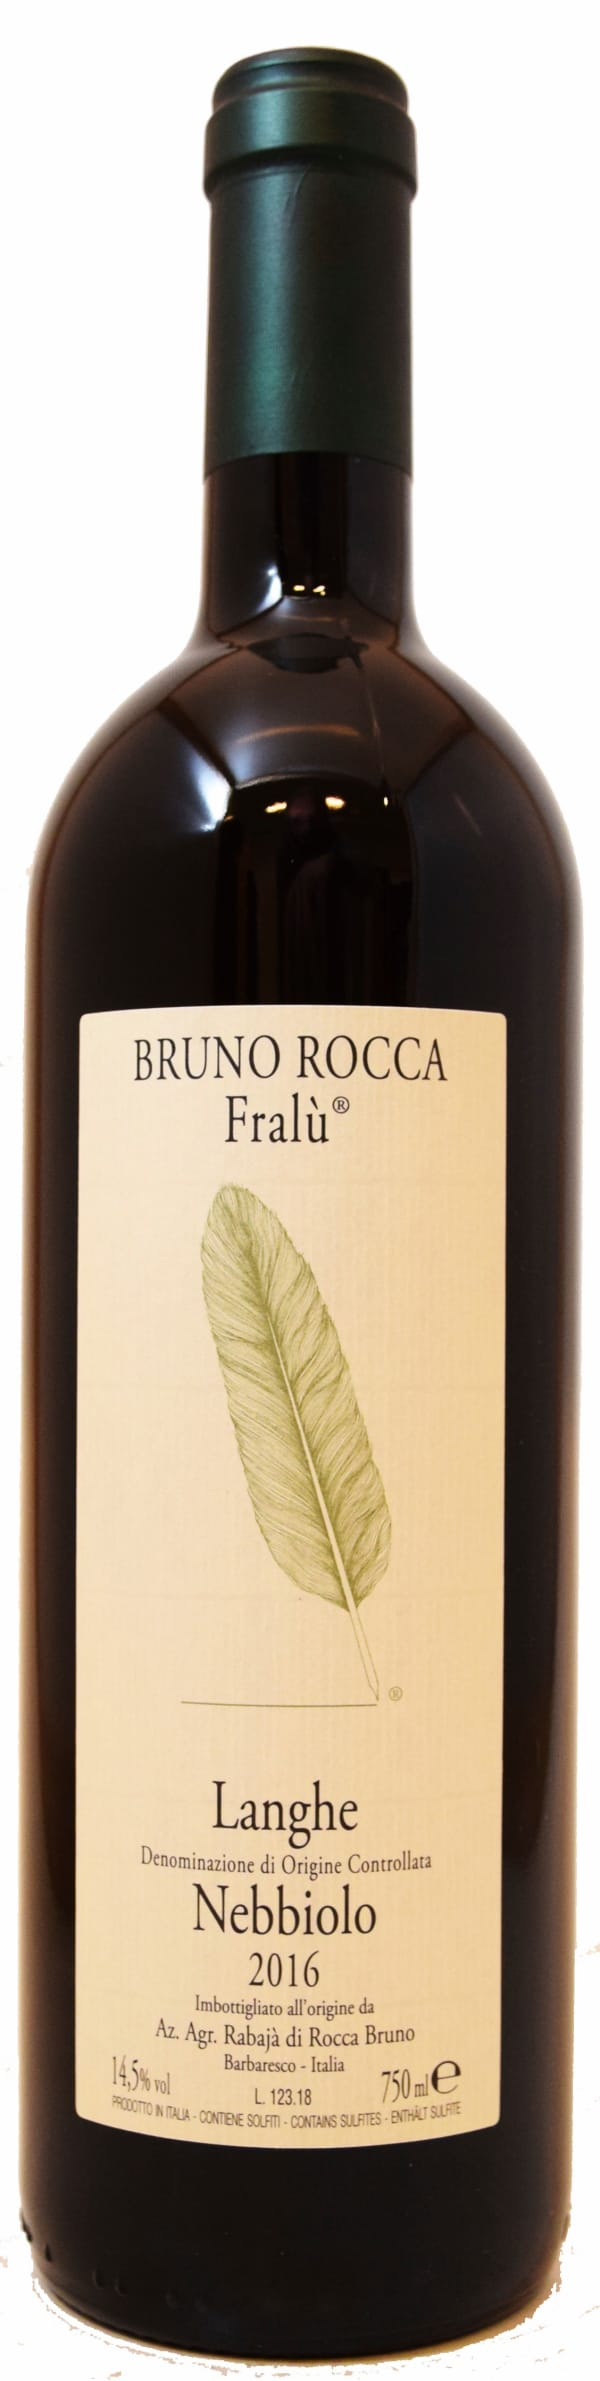 Bruno Rocca Fralu Nebbiolo 2019